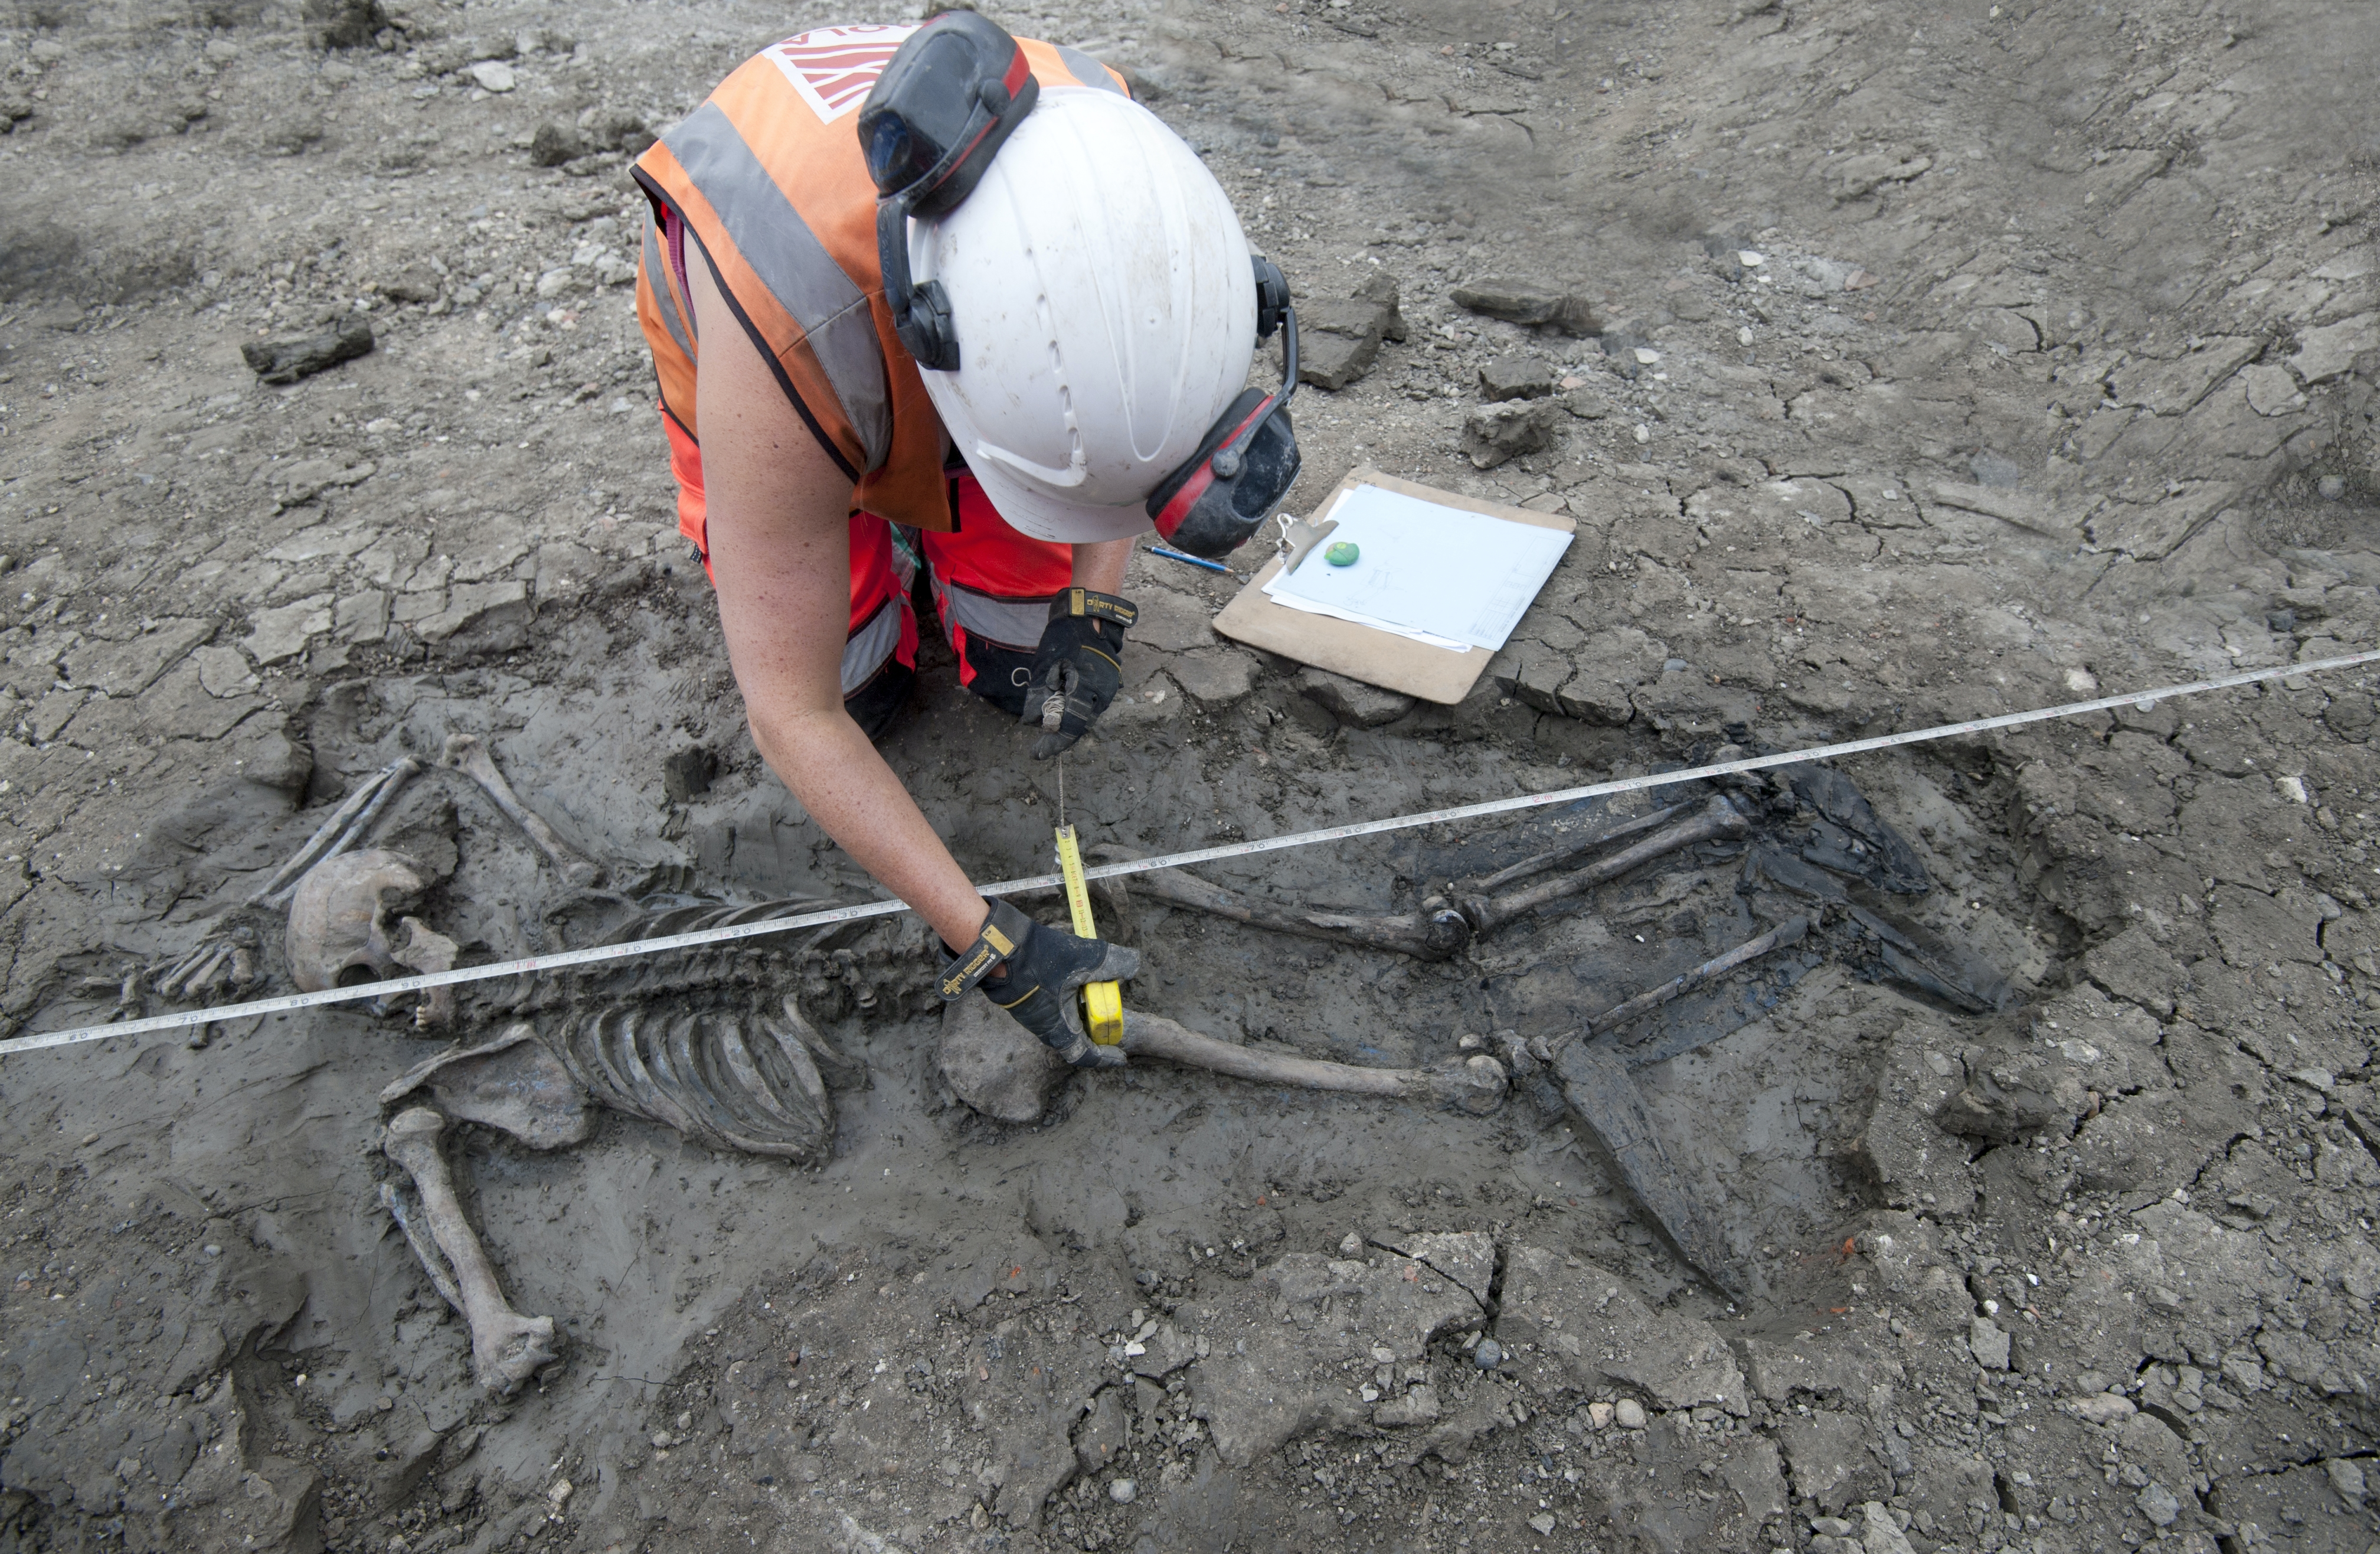 Mystisk! 500 år gammelt skelet fundet med sjældne støvler på